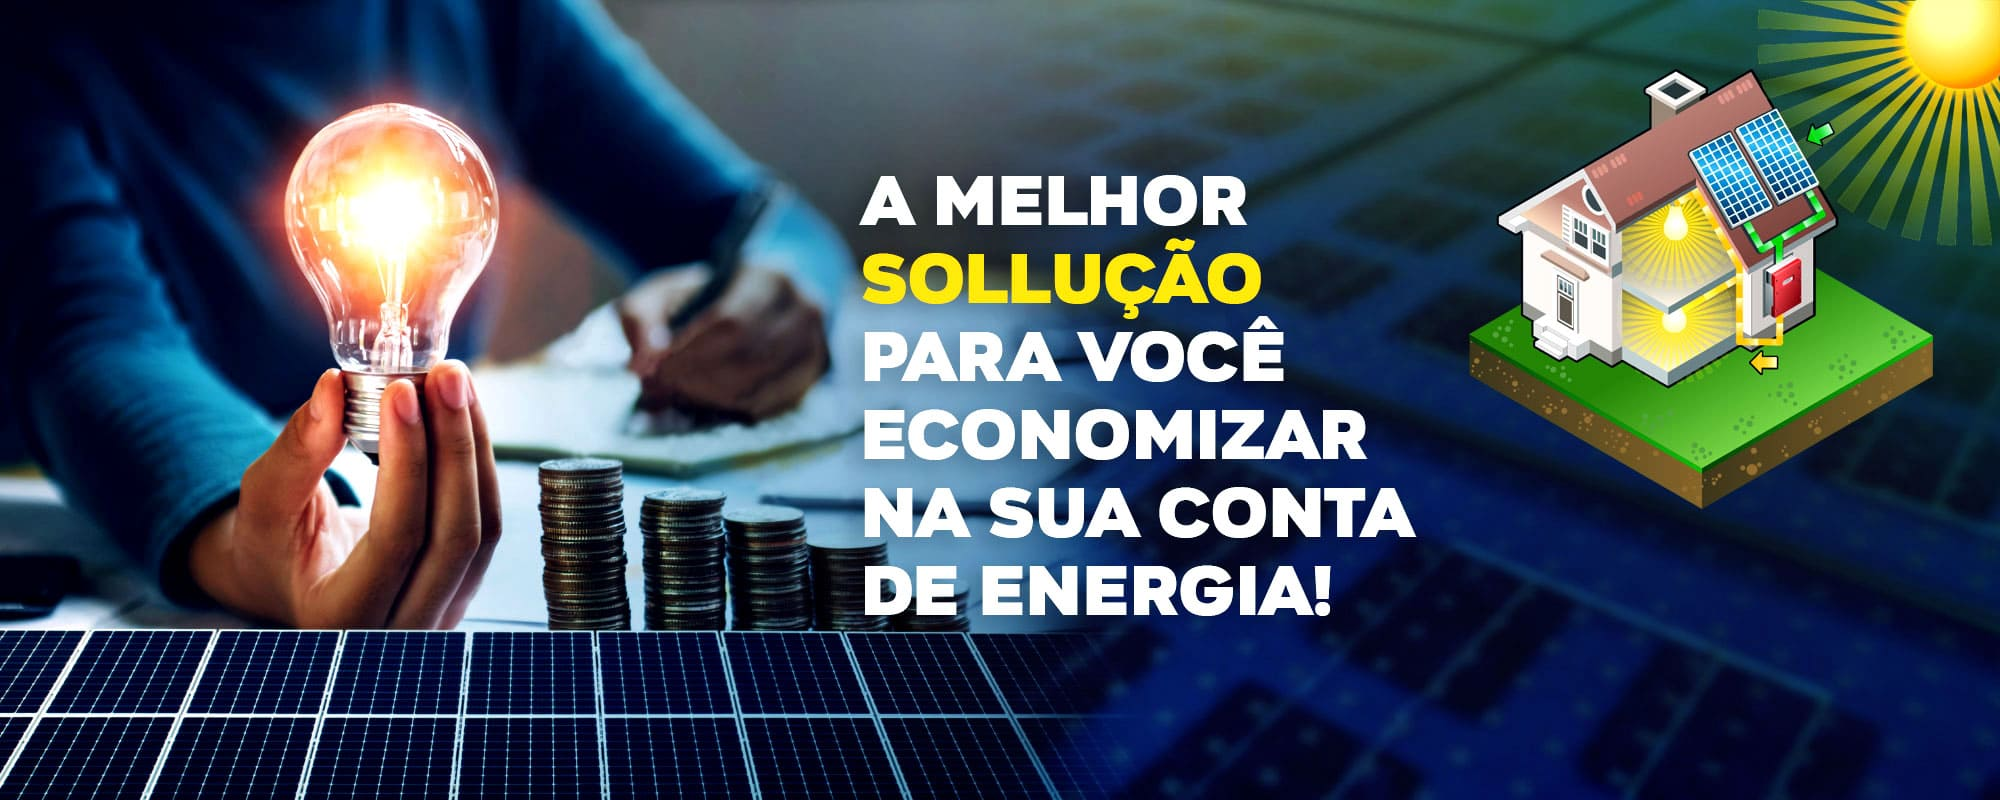 banner-sollucao-energiasolar